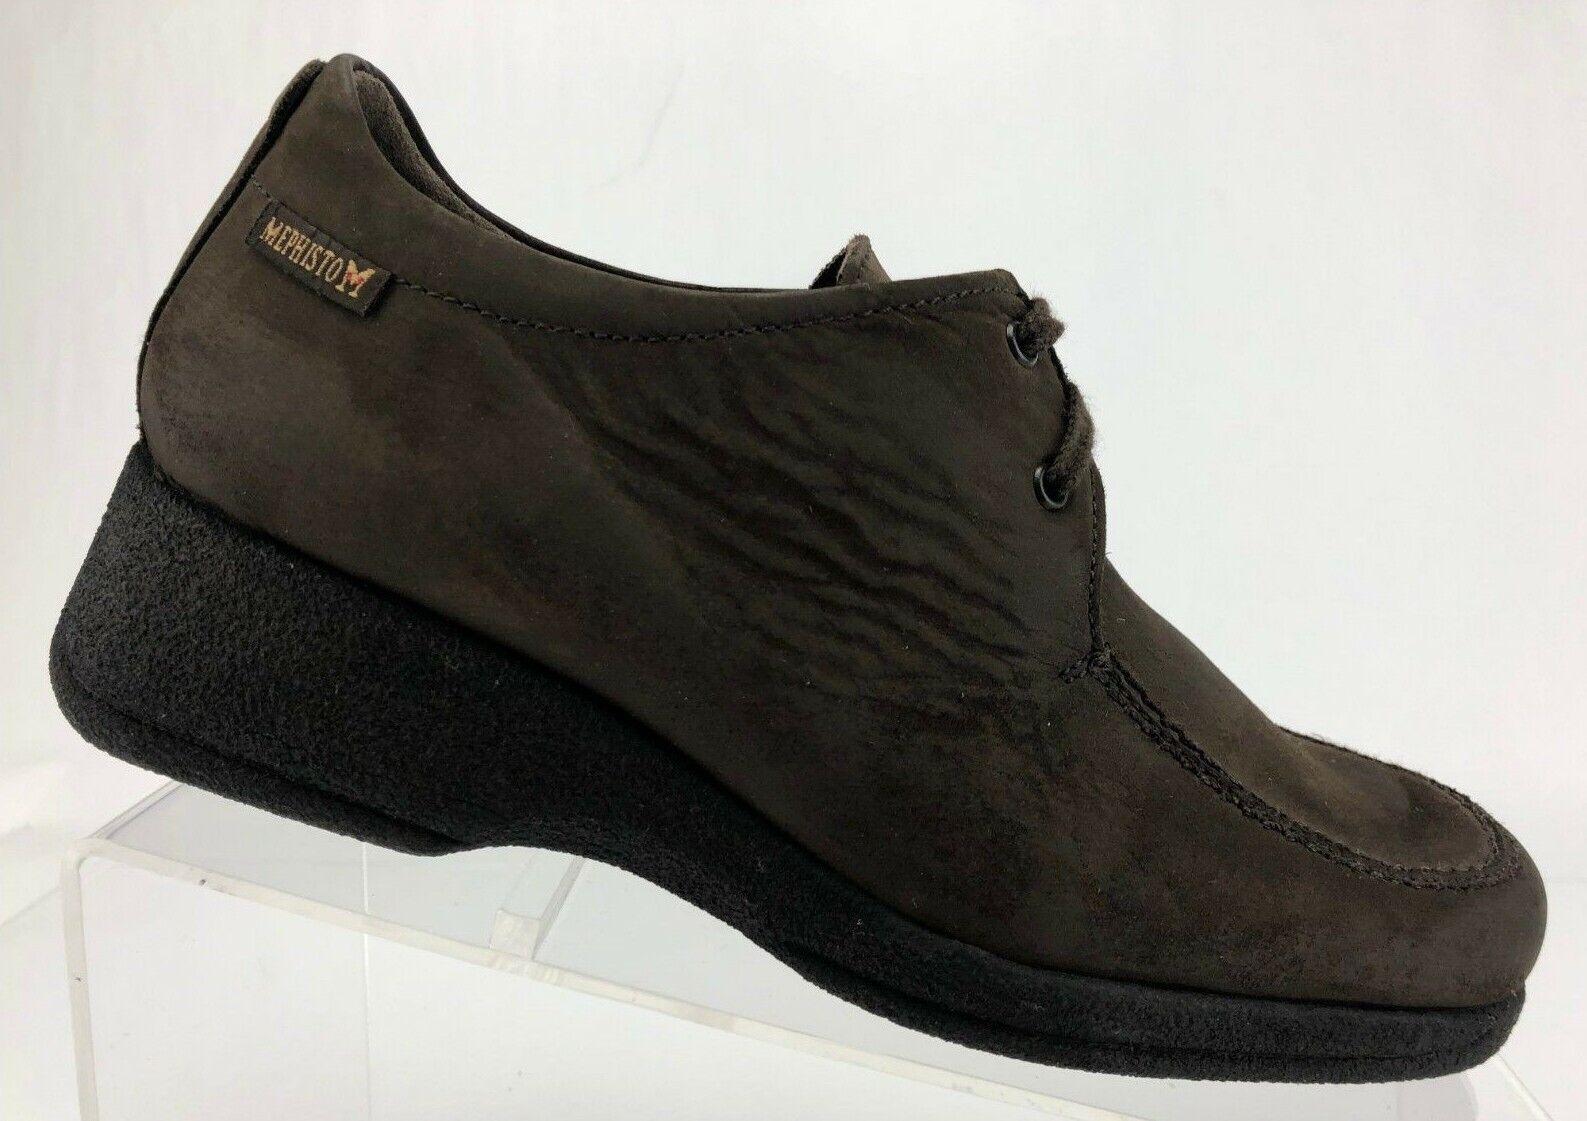 Mephisto Air Relax Oxfords Comfy Apron Toe braun Platform Leather Leather Platform schuhe damen 7 396c9e